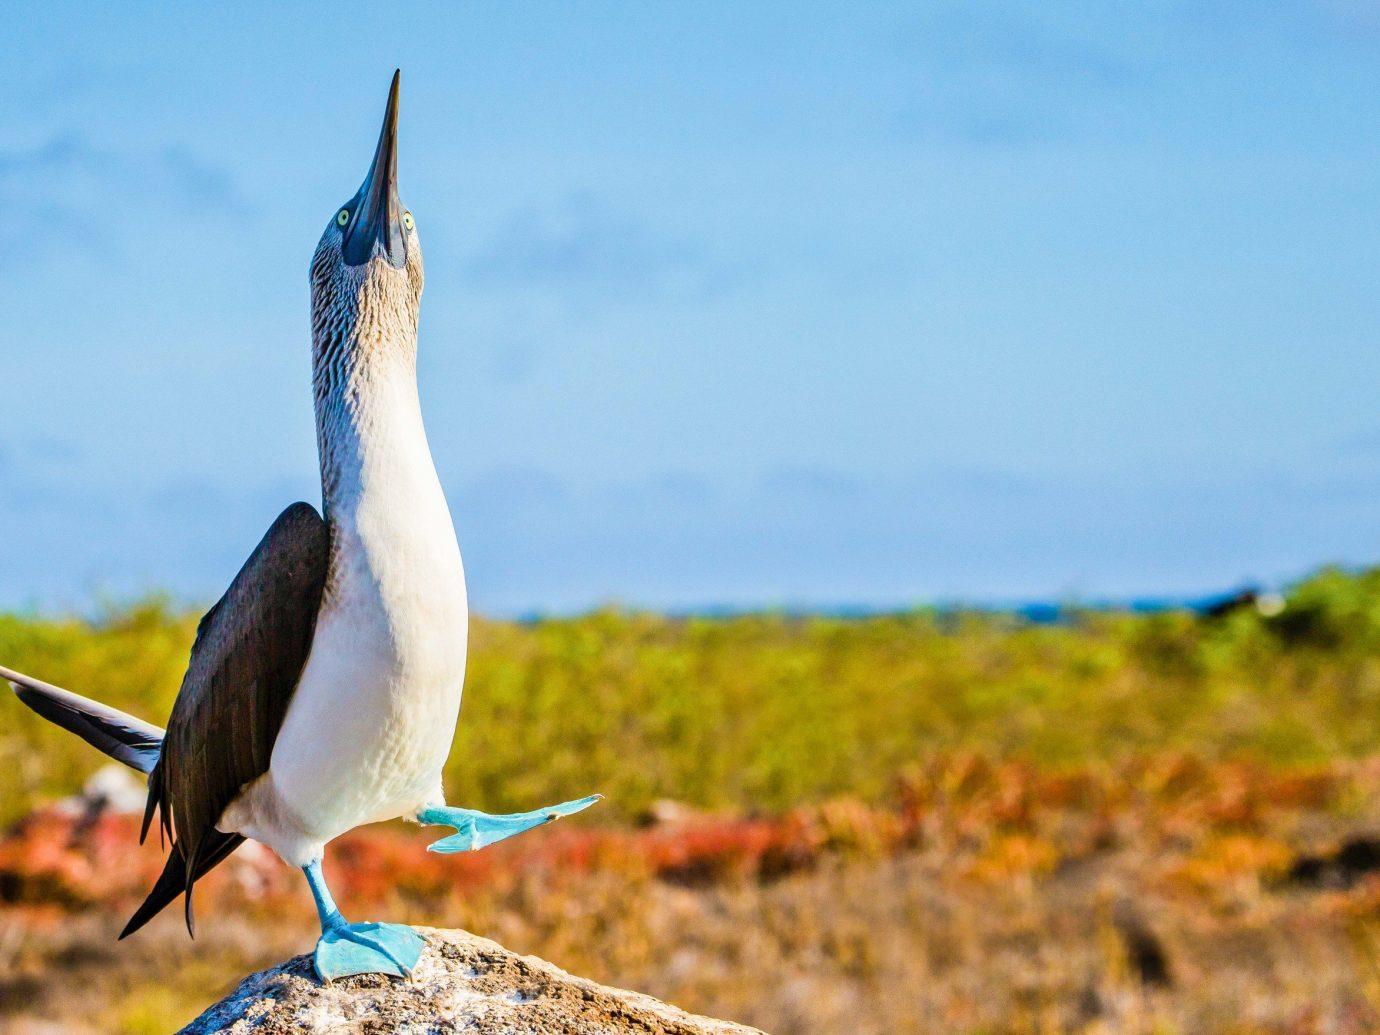 sky Bird ecosystem fauna beak Wildlife seabird ecoregion